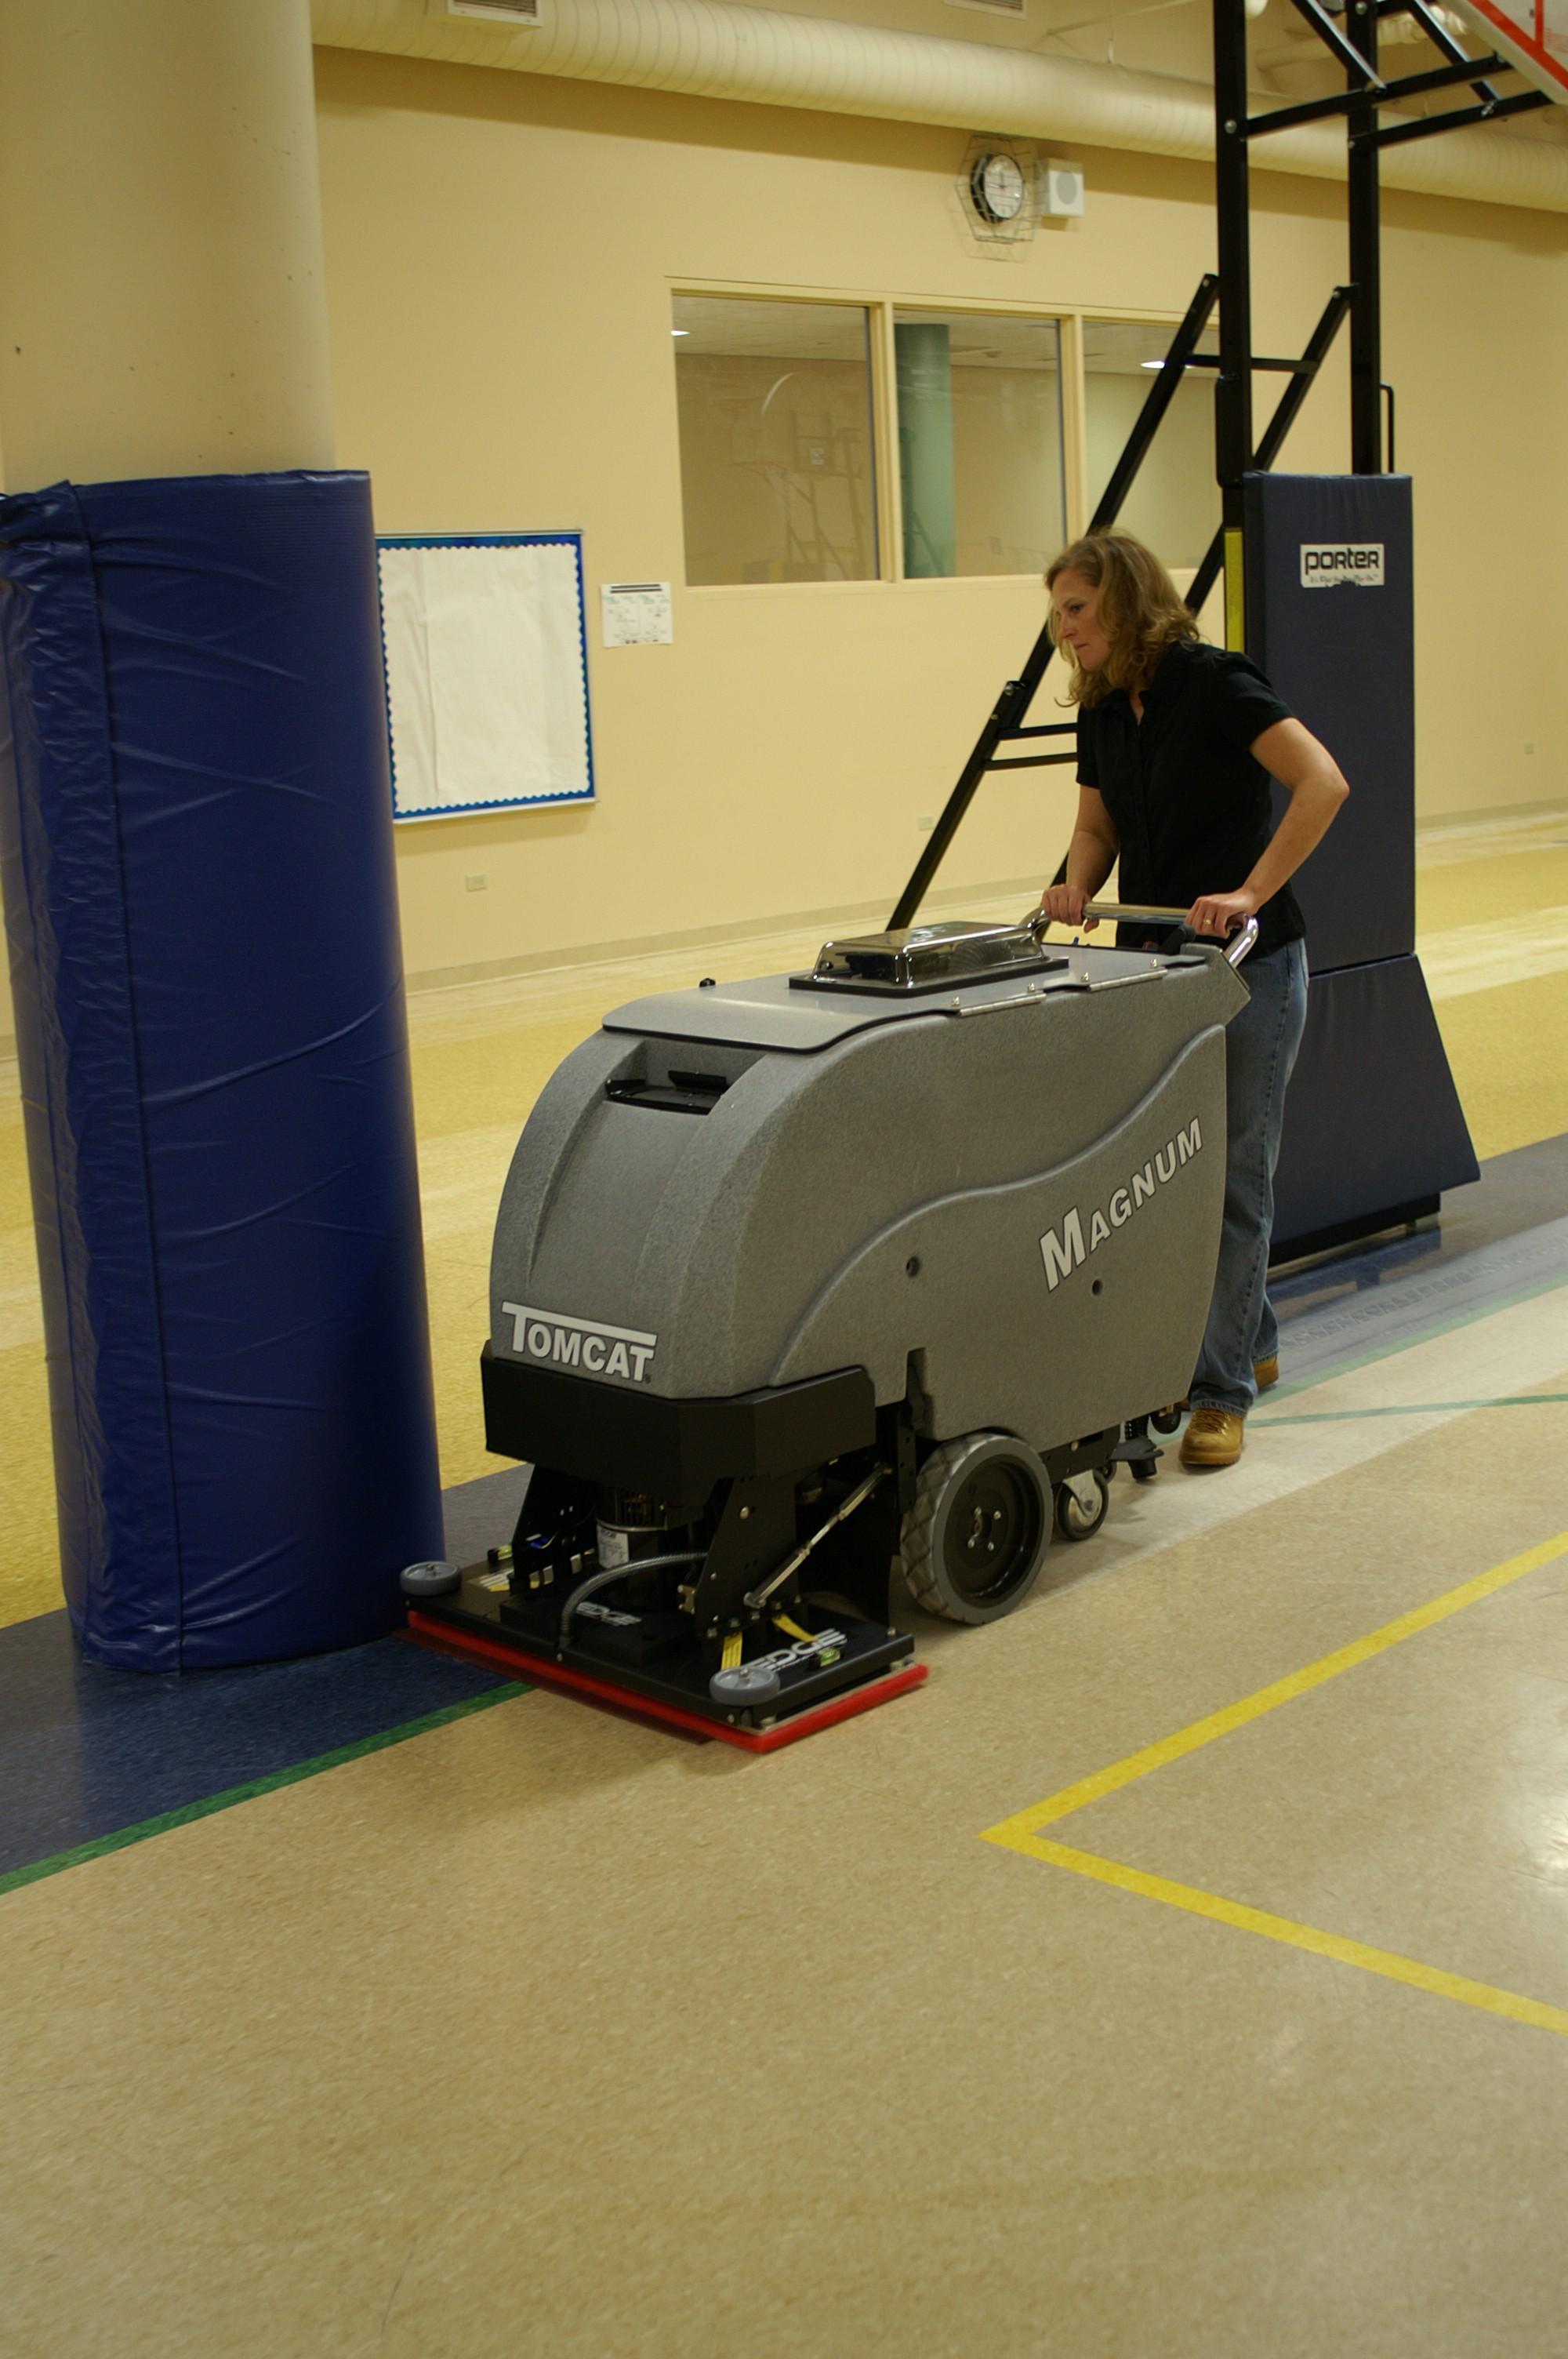 system hero floors tc dryer clean floor tomcat scrubber inc product